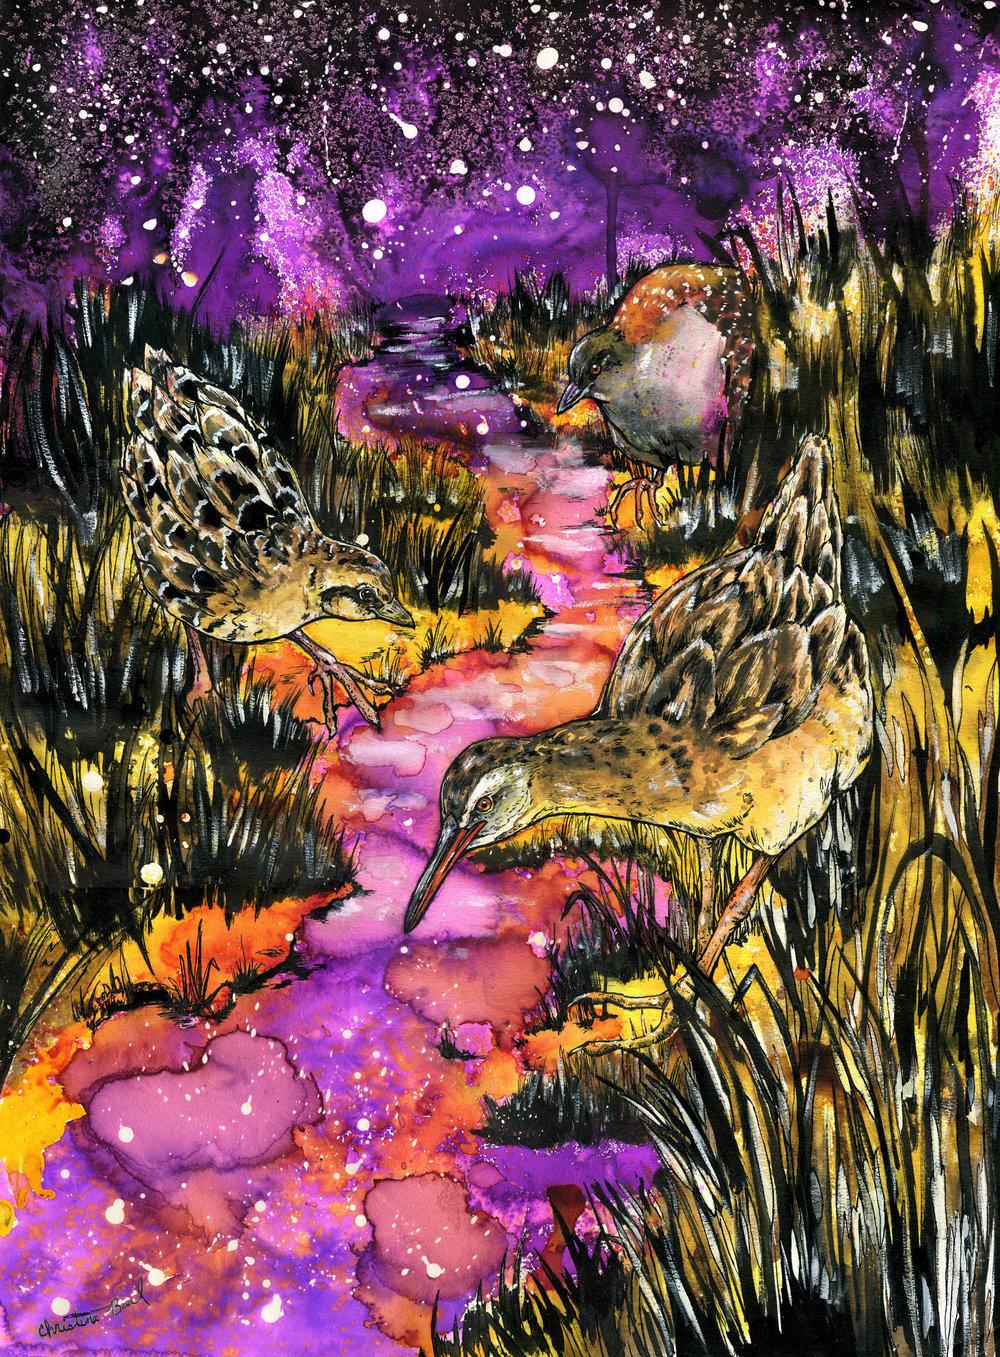 Starlit Swamp Tigers